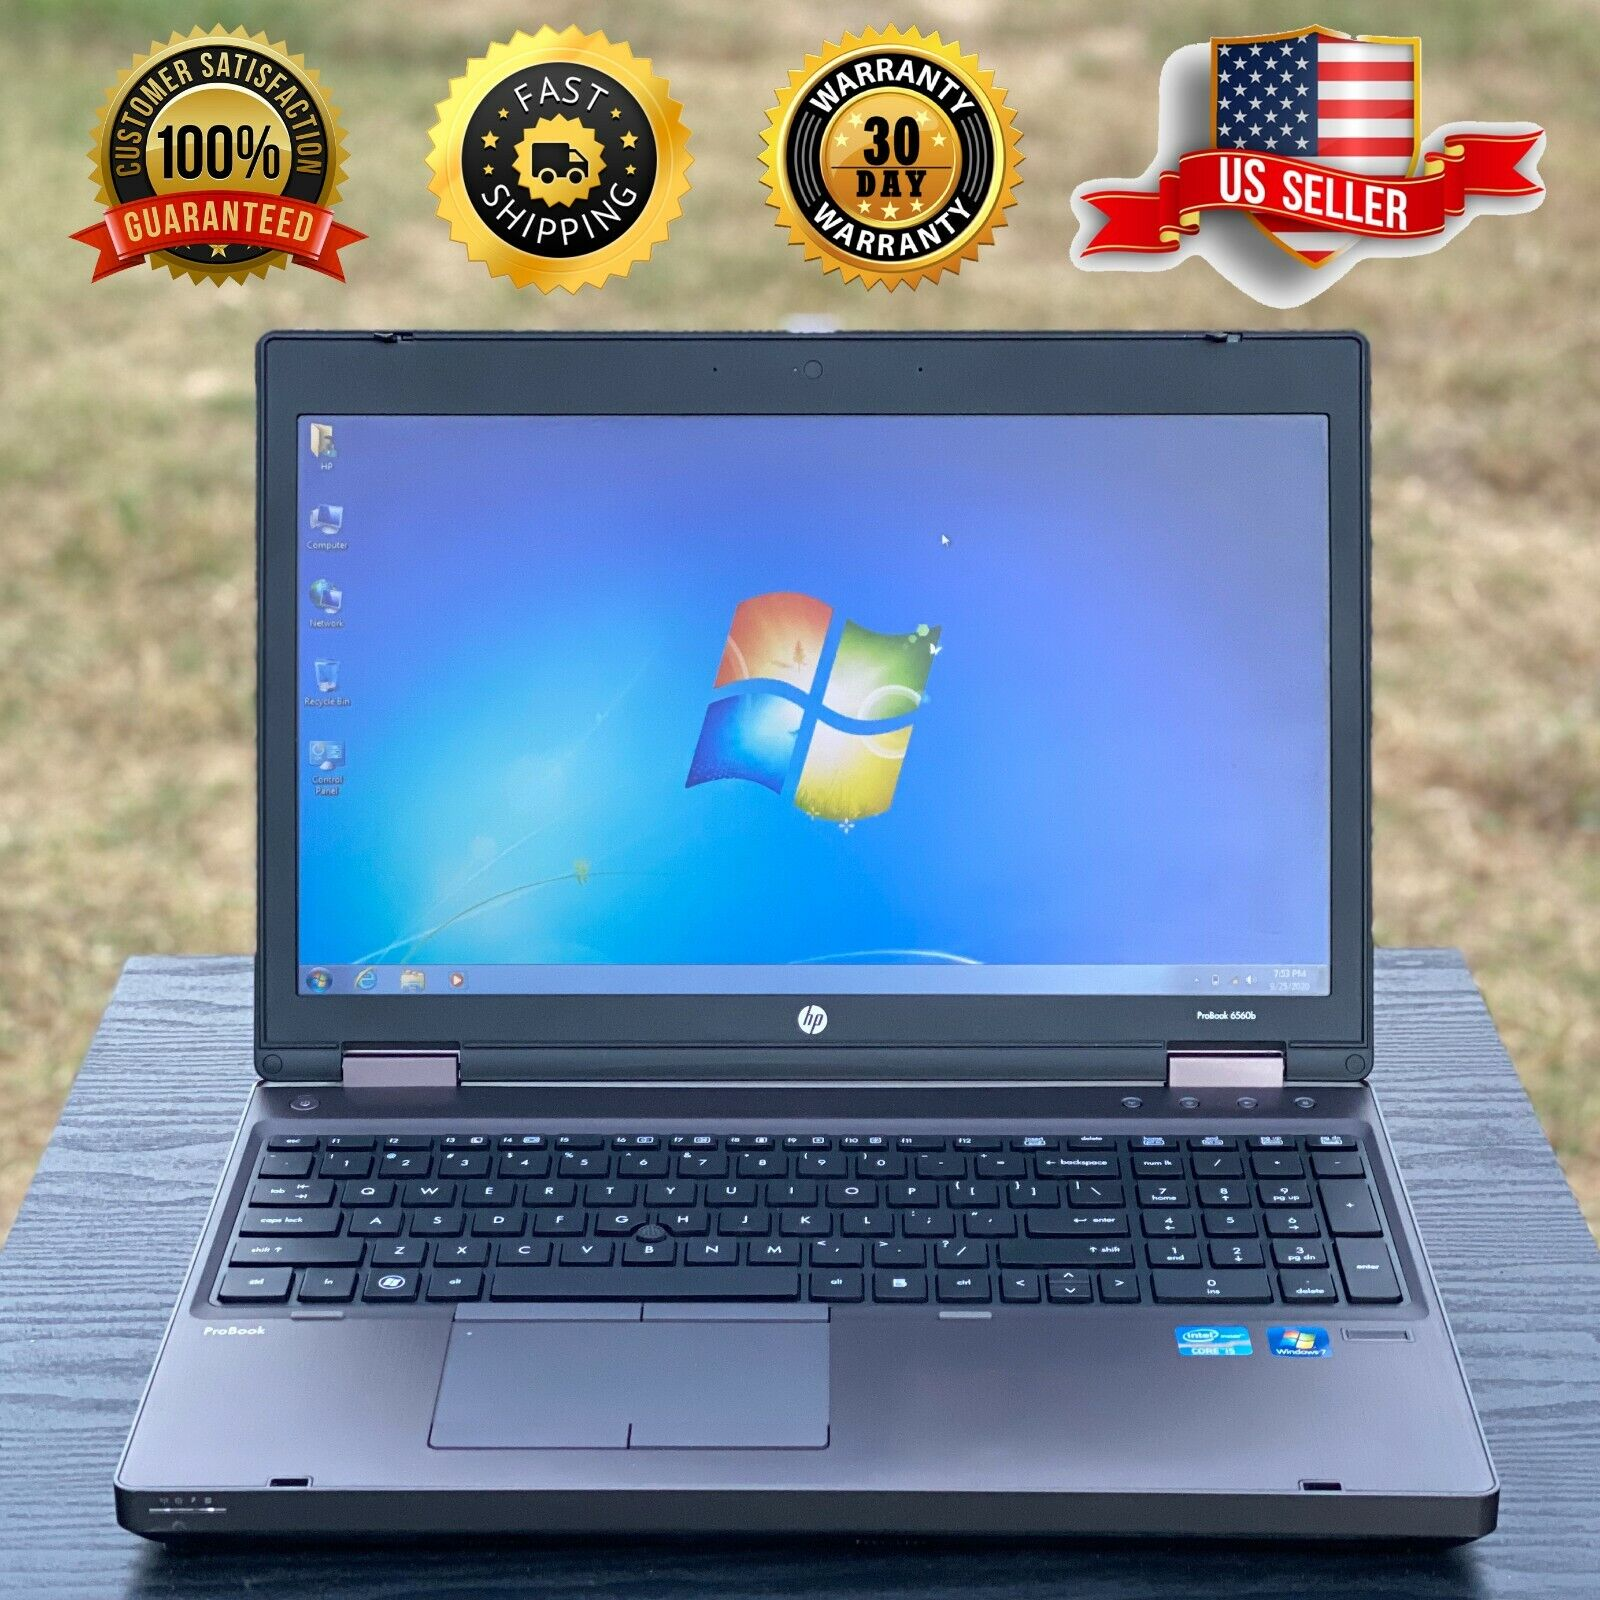 Laptop Windows - HP ProBoook Laptop With Microsoft Office | Windows 7 Pro | Core i5 | DVD | WIFI